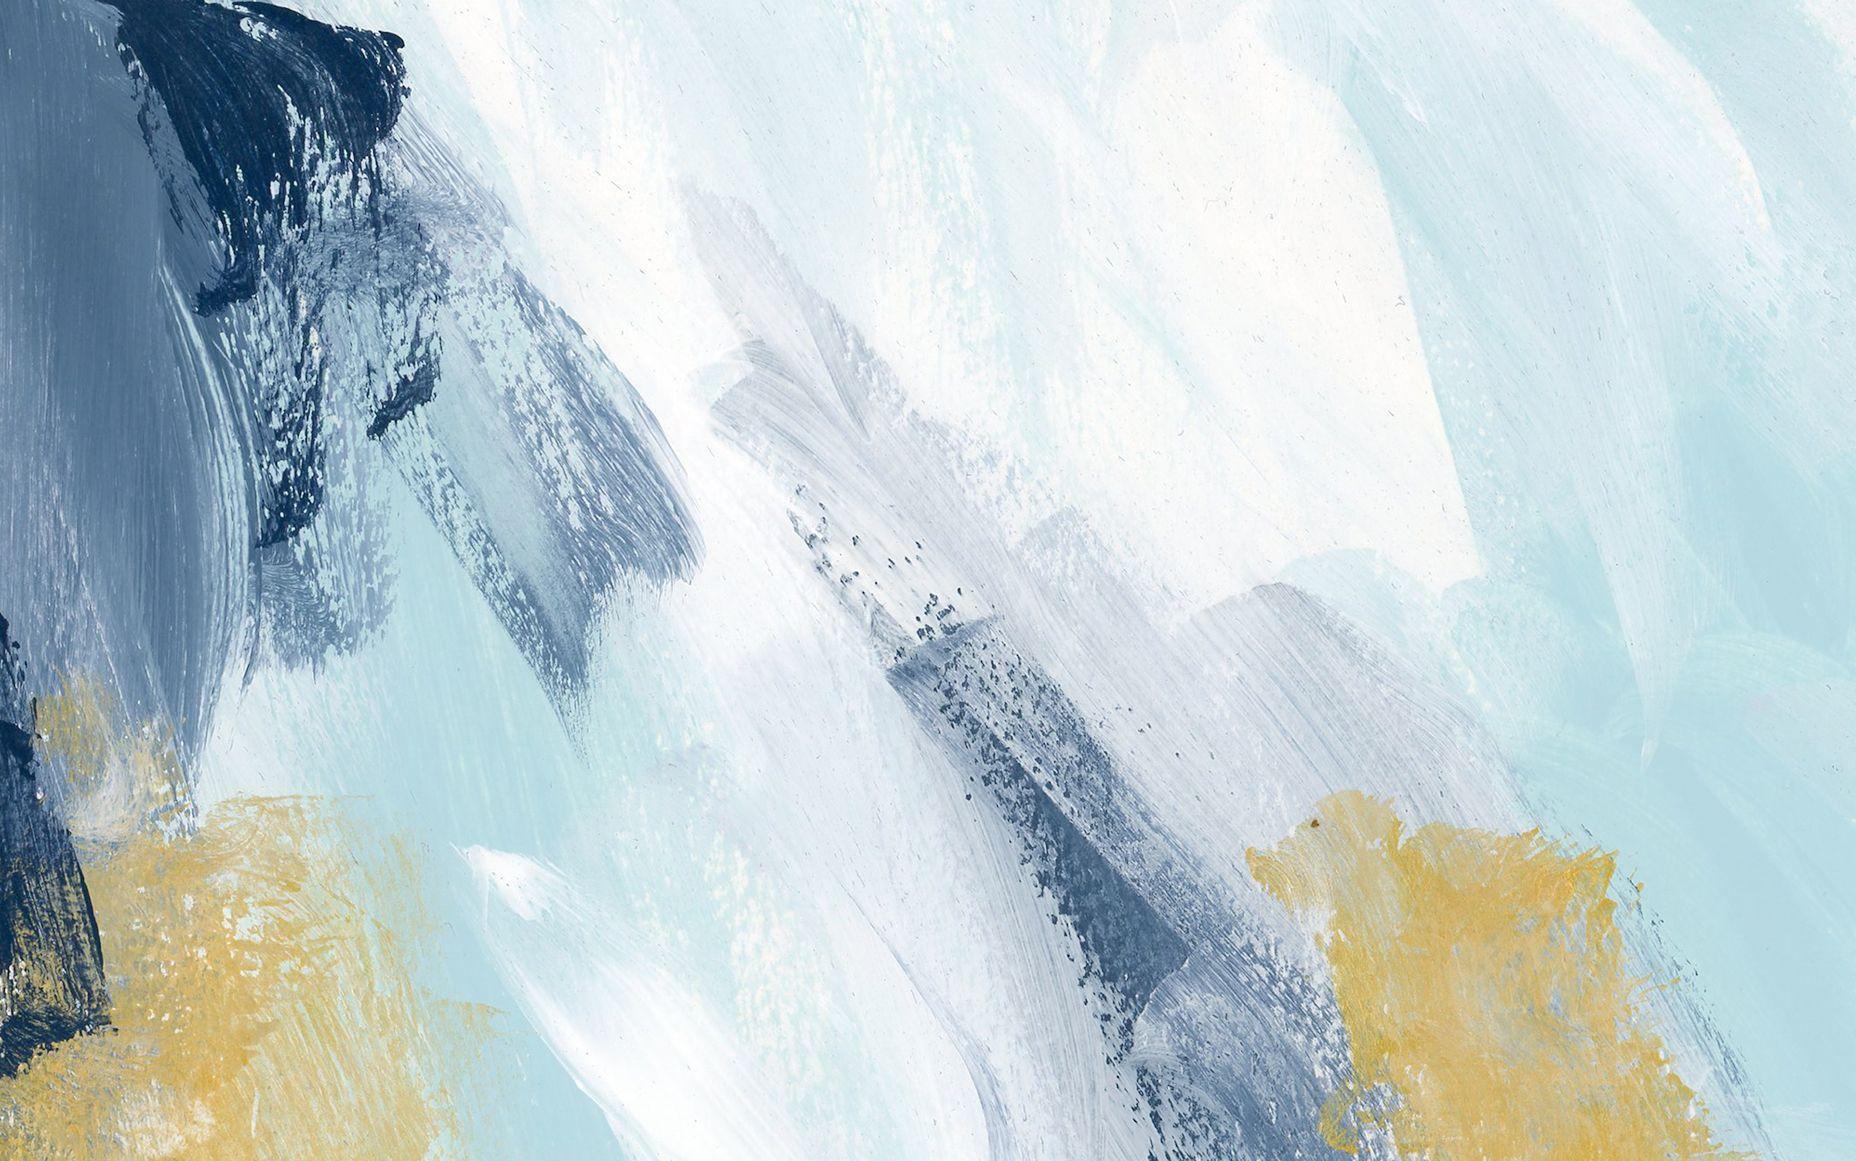 Simple Desktop Watercolor Wallpapers Top Free Simple Desktop Watercolor Backgrounds Wallpaperaccess